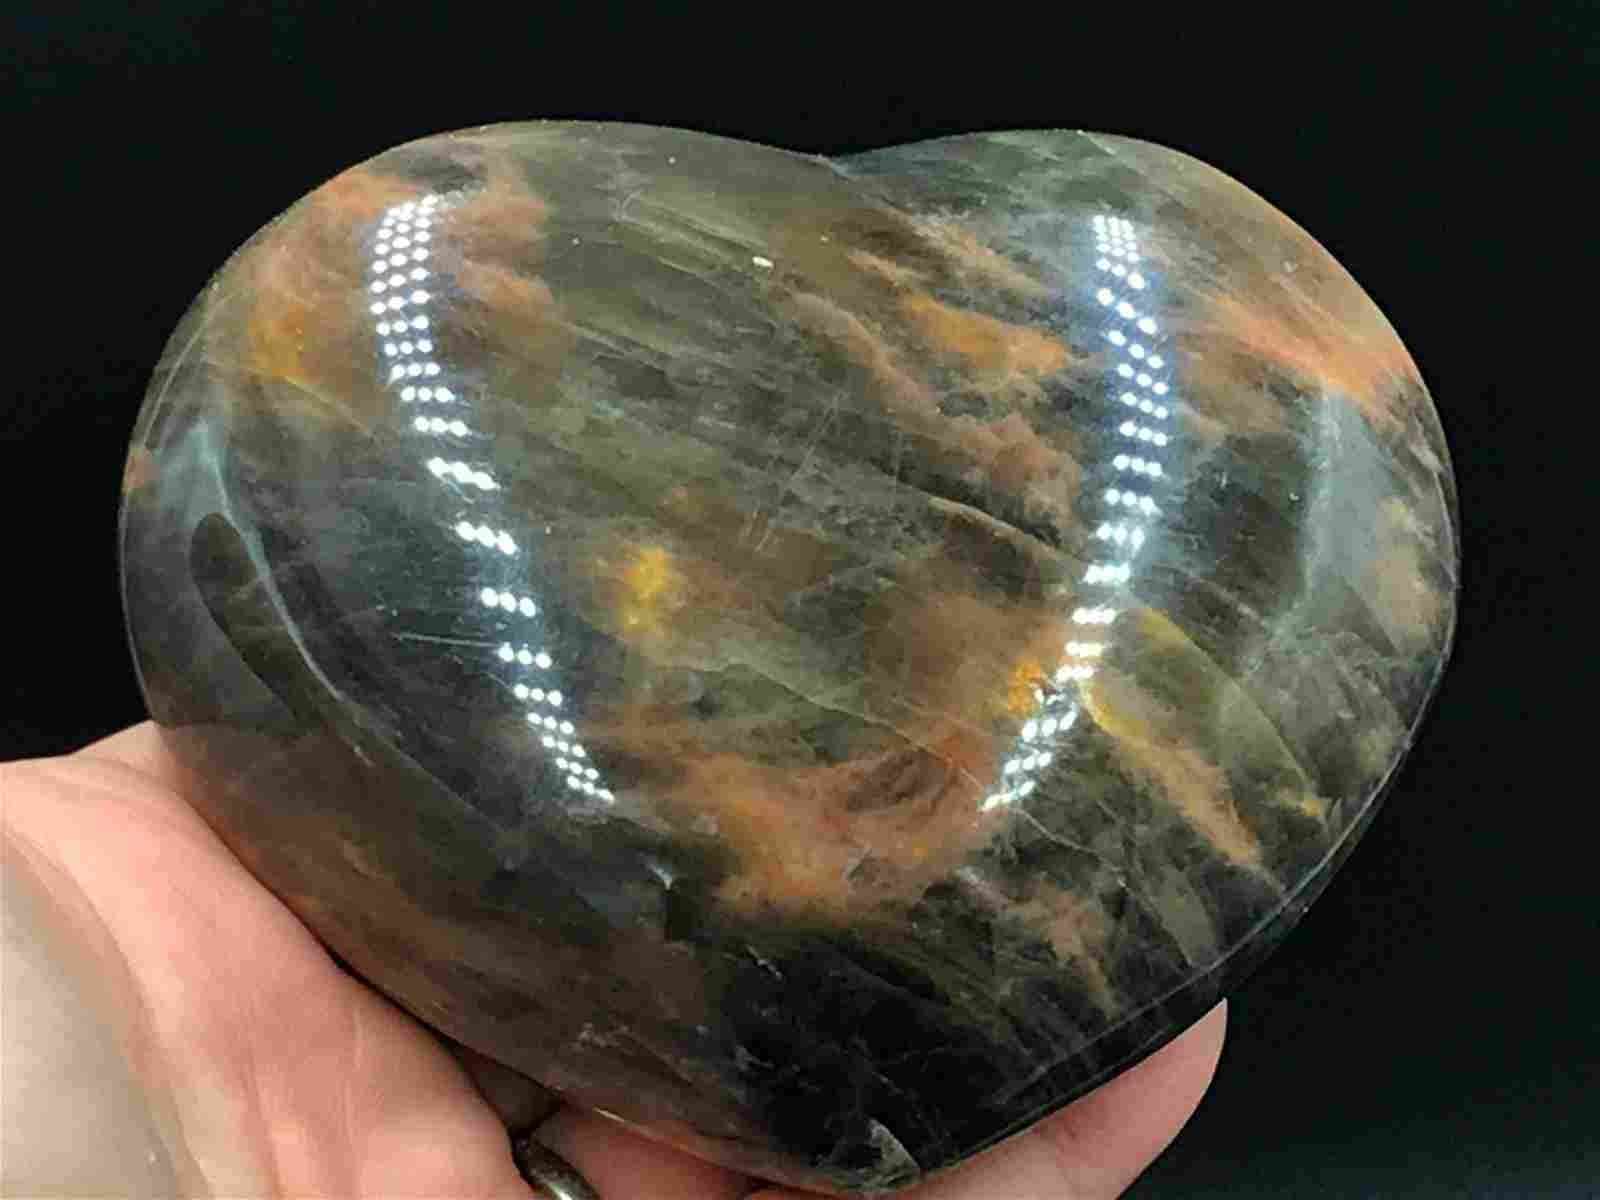 Rock, Crystal, Natural, Collectible, Carving, Heart